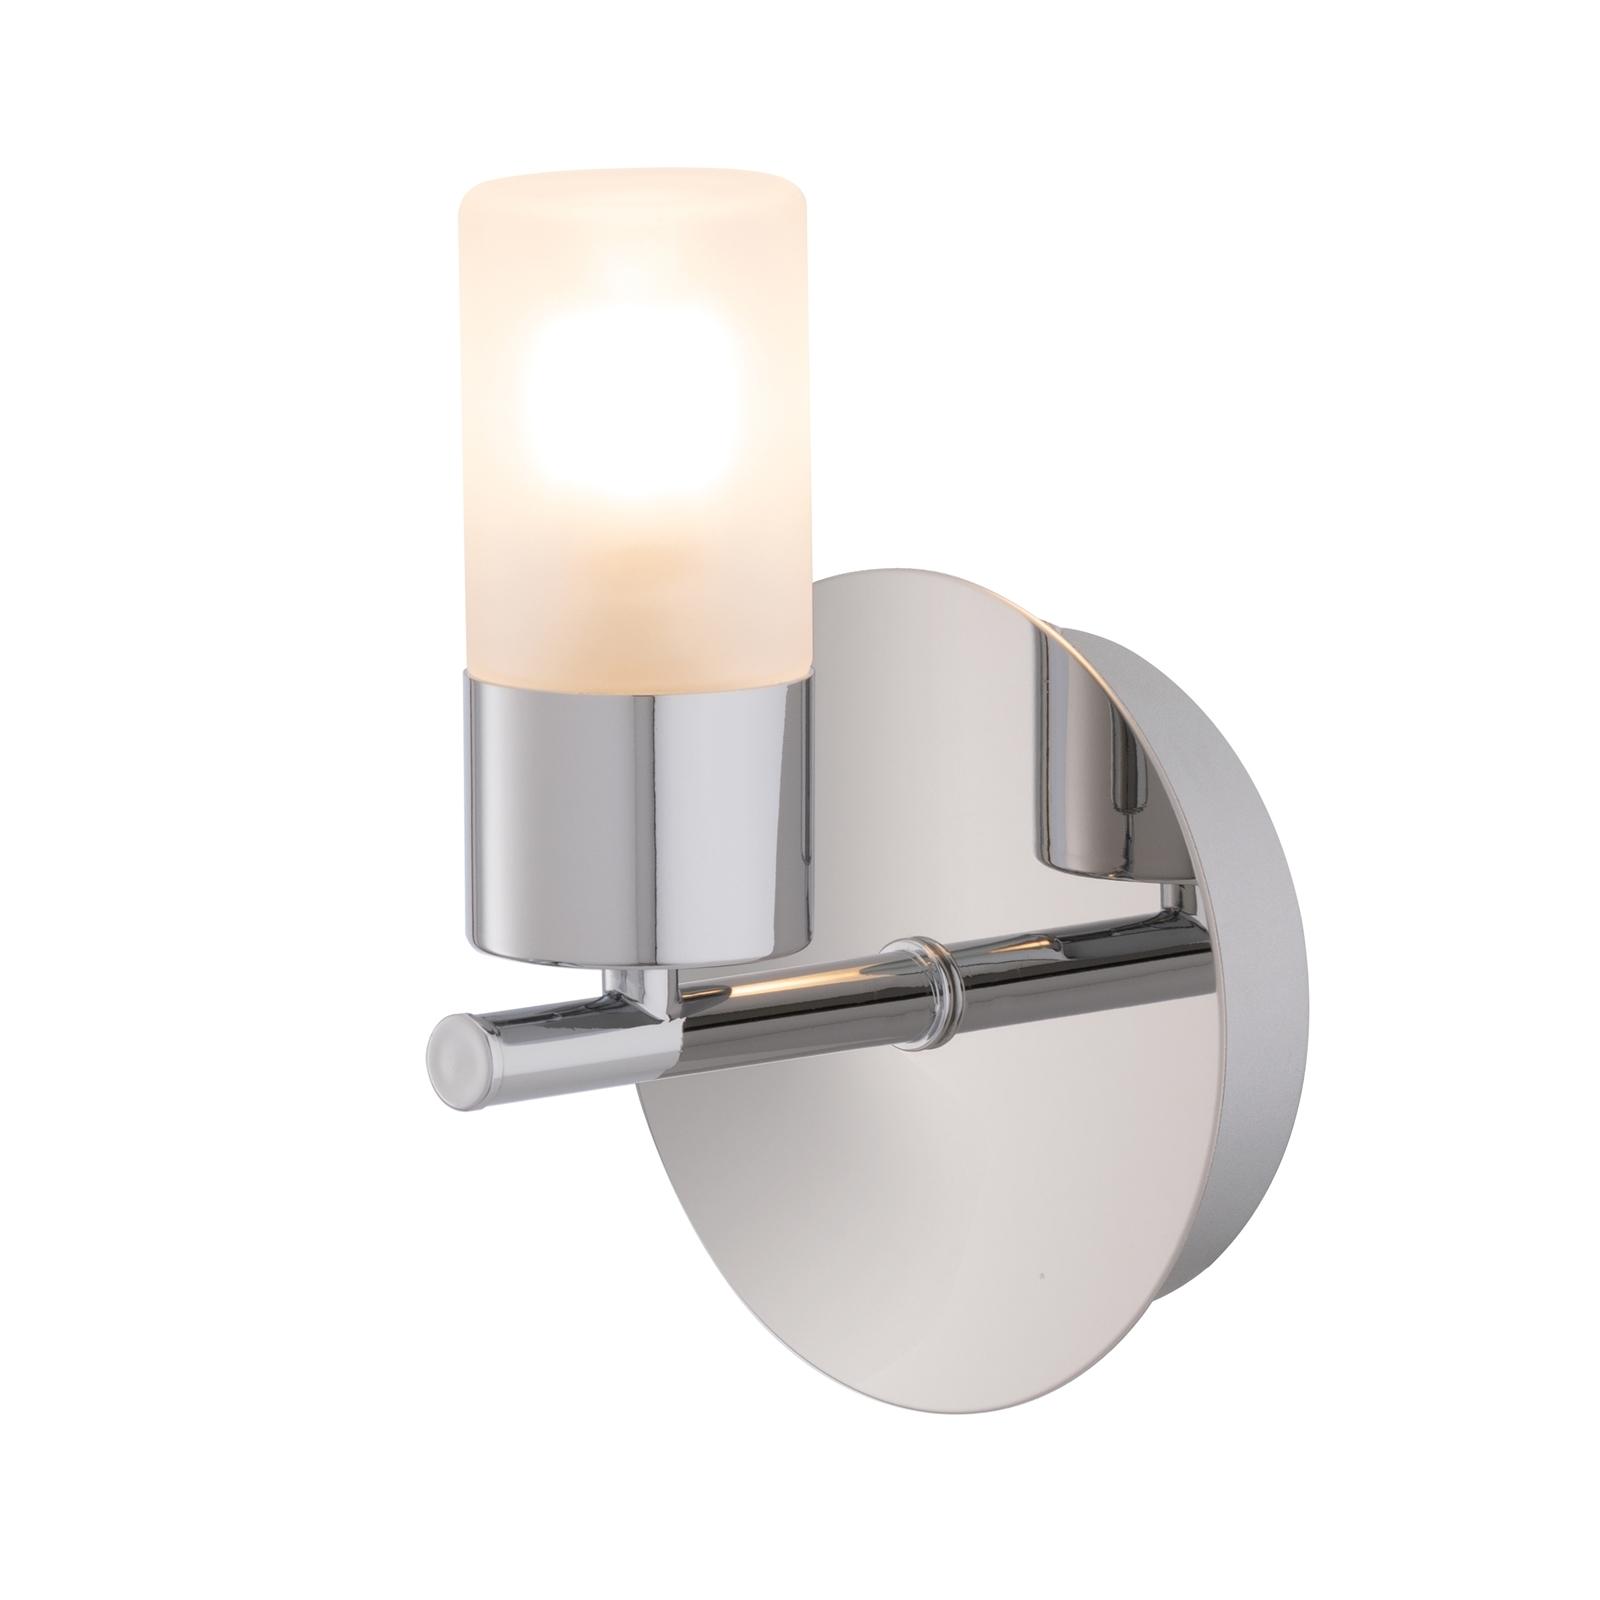 Verve Design 3W Riley Bathroom Vanity Light